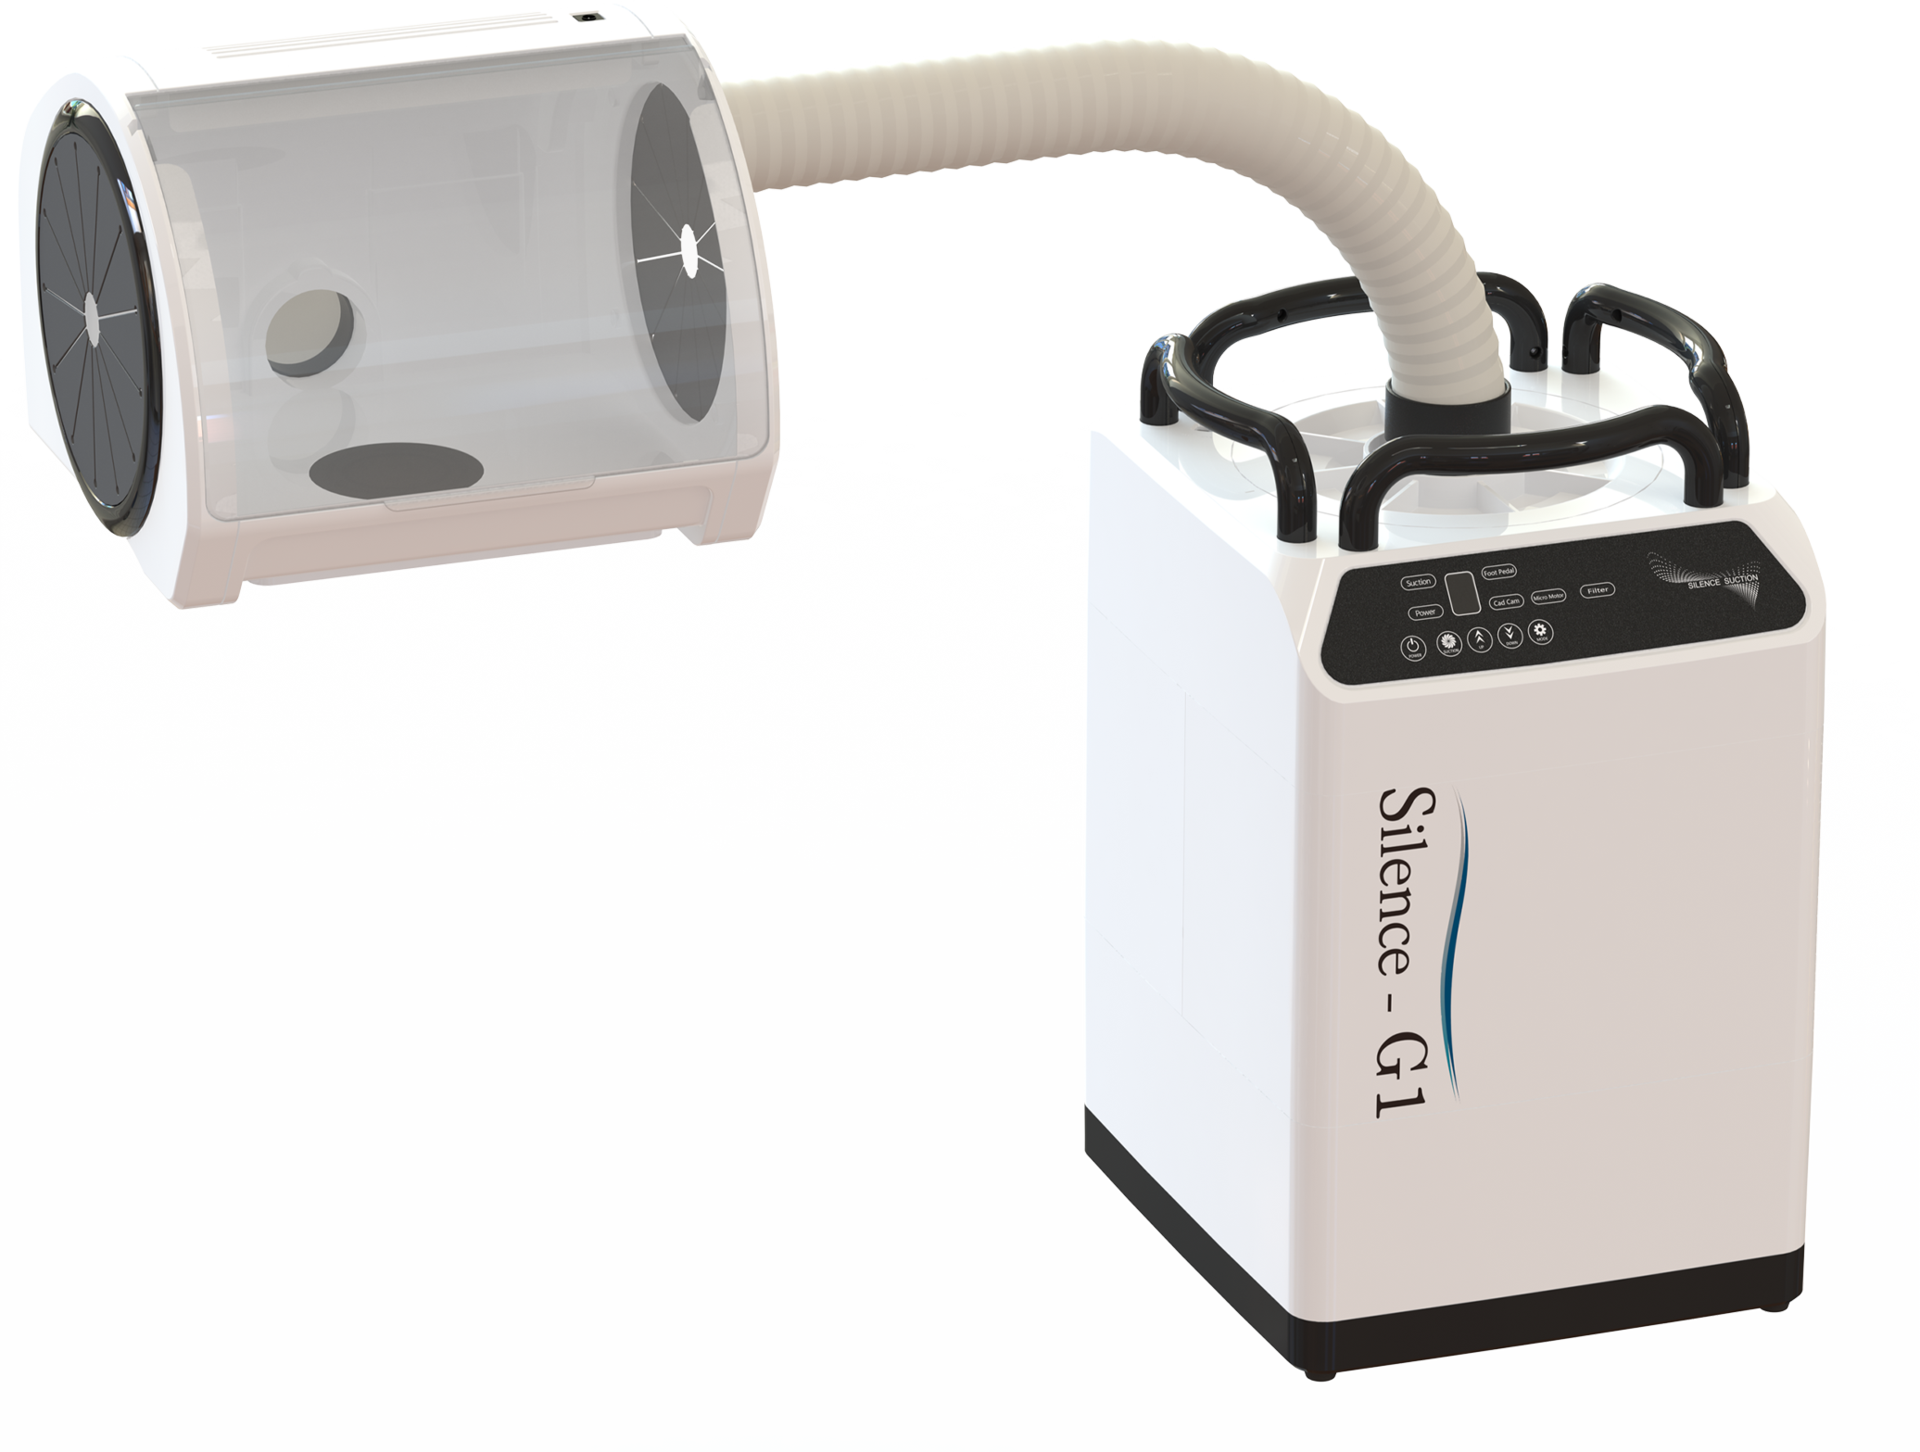 KO-MAX_Silence-A100_extraoral vacuum suction_Aerosol suction_dental dust collector_dermatology laser inhaler_dust collector_UVC LED sterilization_plasma sterilizer